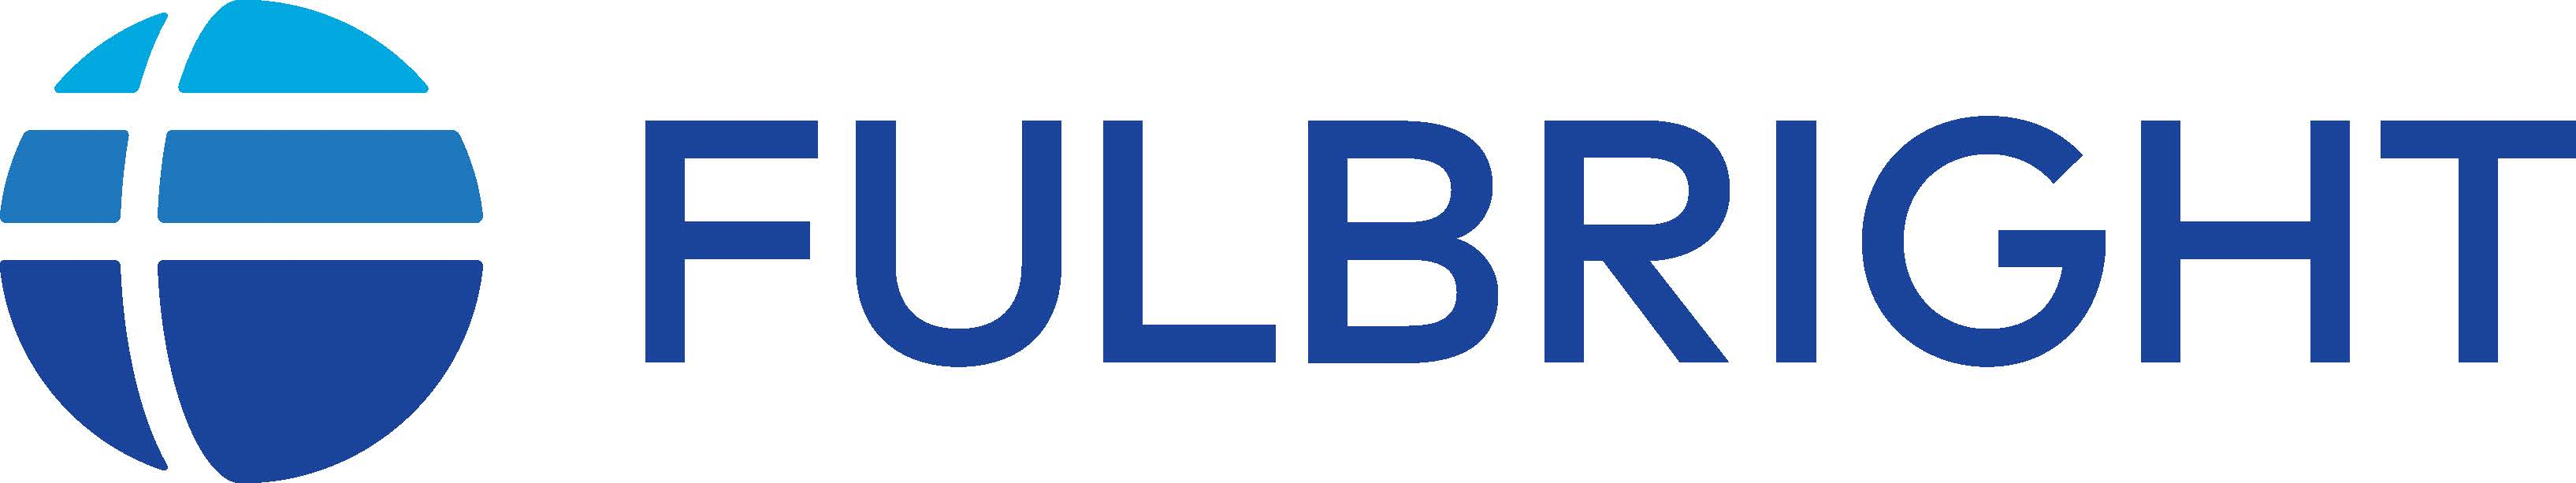 The Fulbright logo